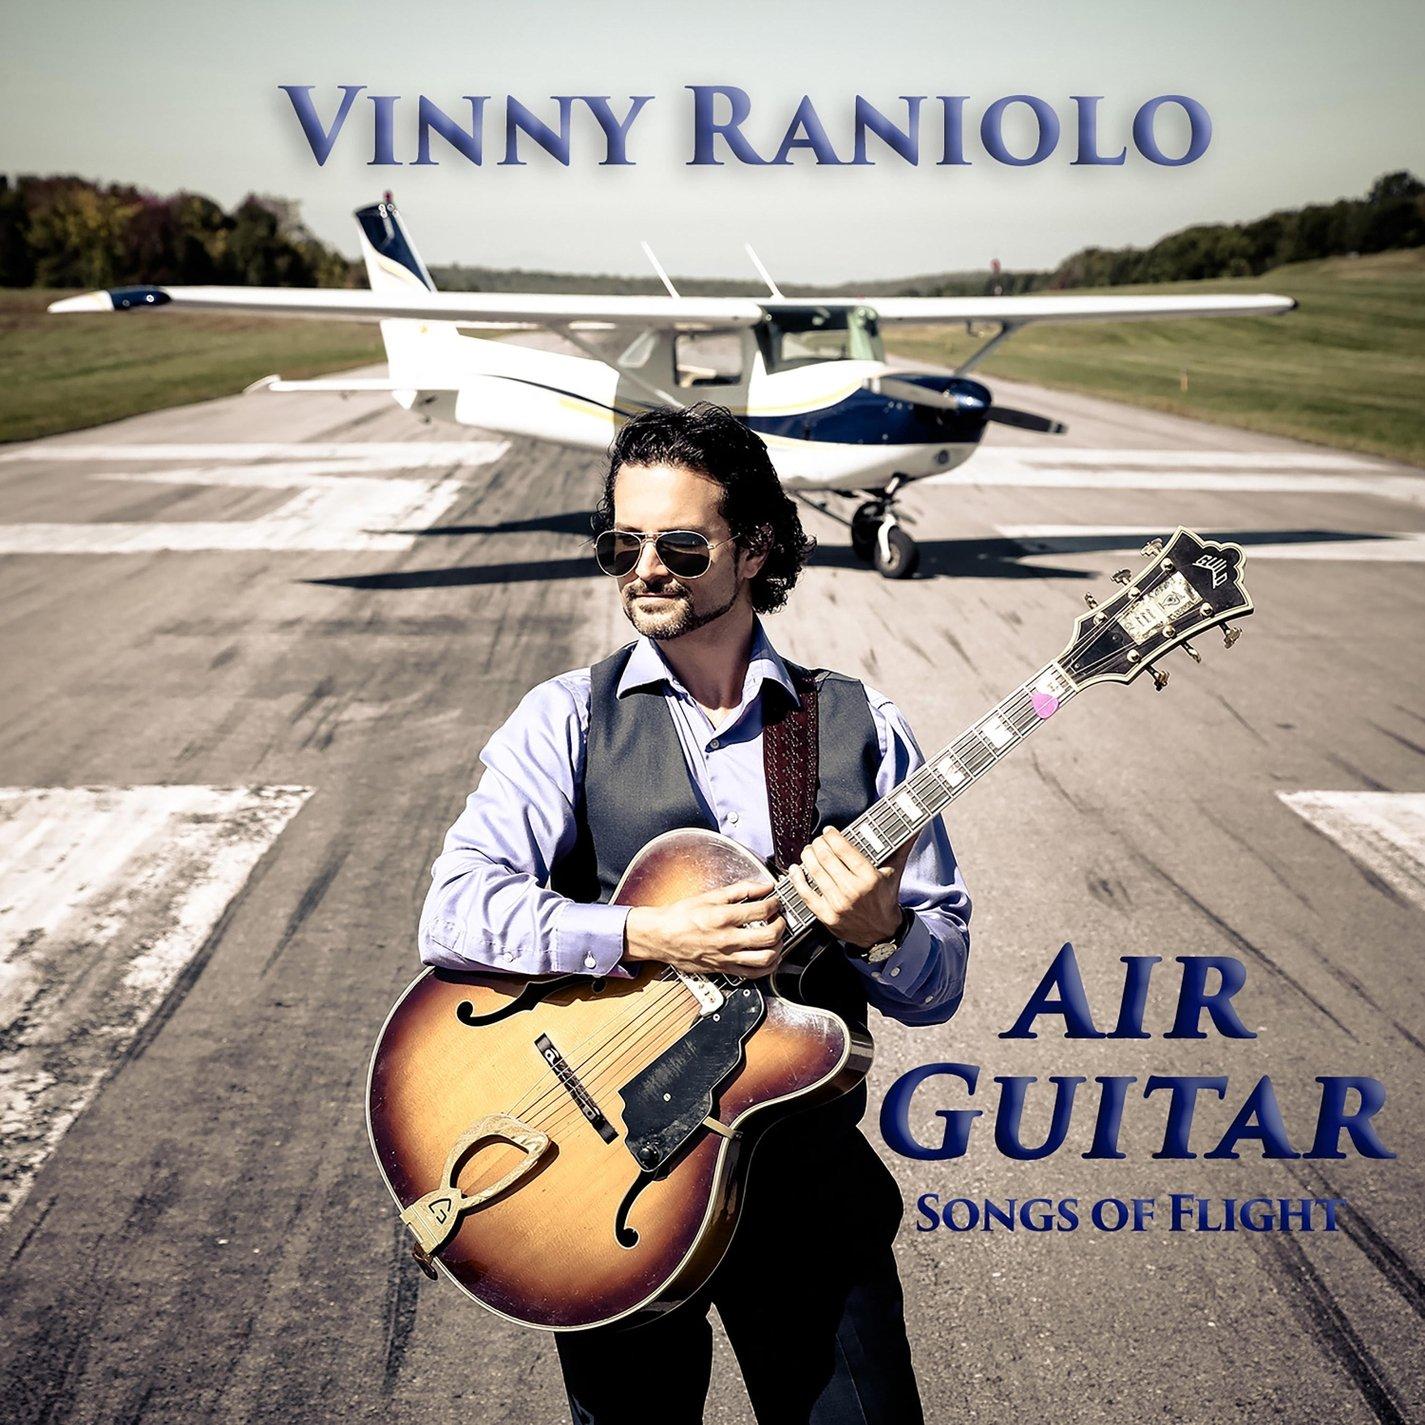 Vinny Raniolo Air Guitar Amazon Music